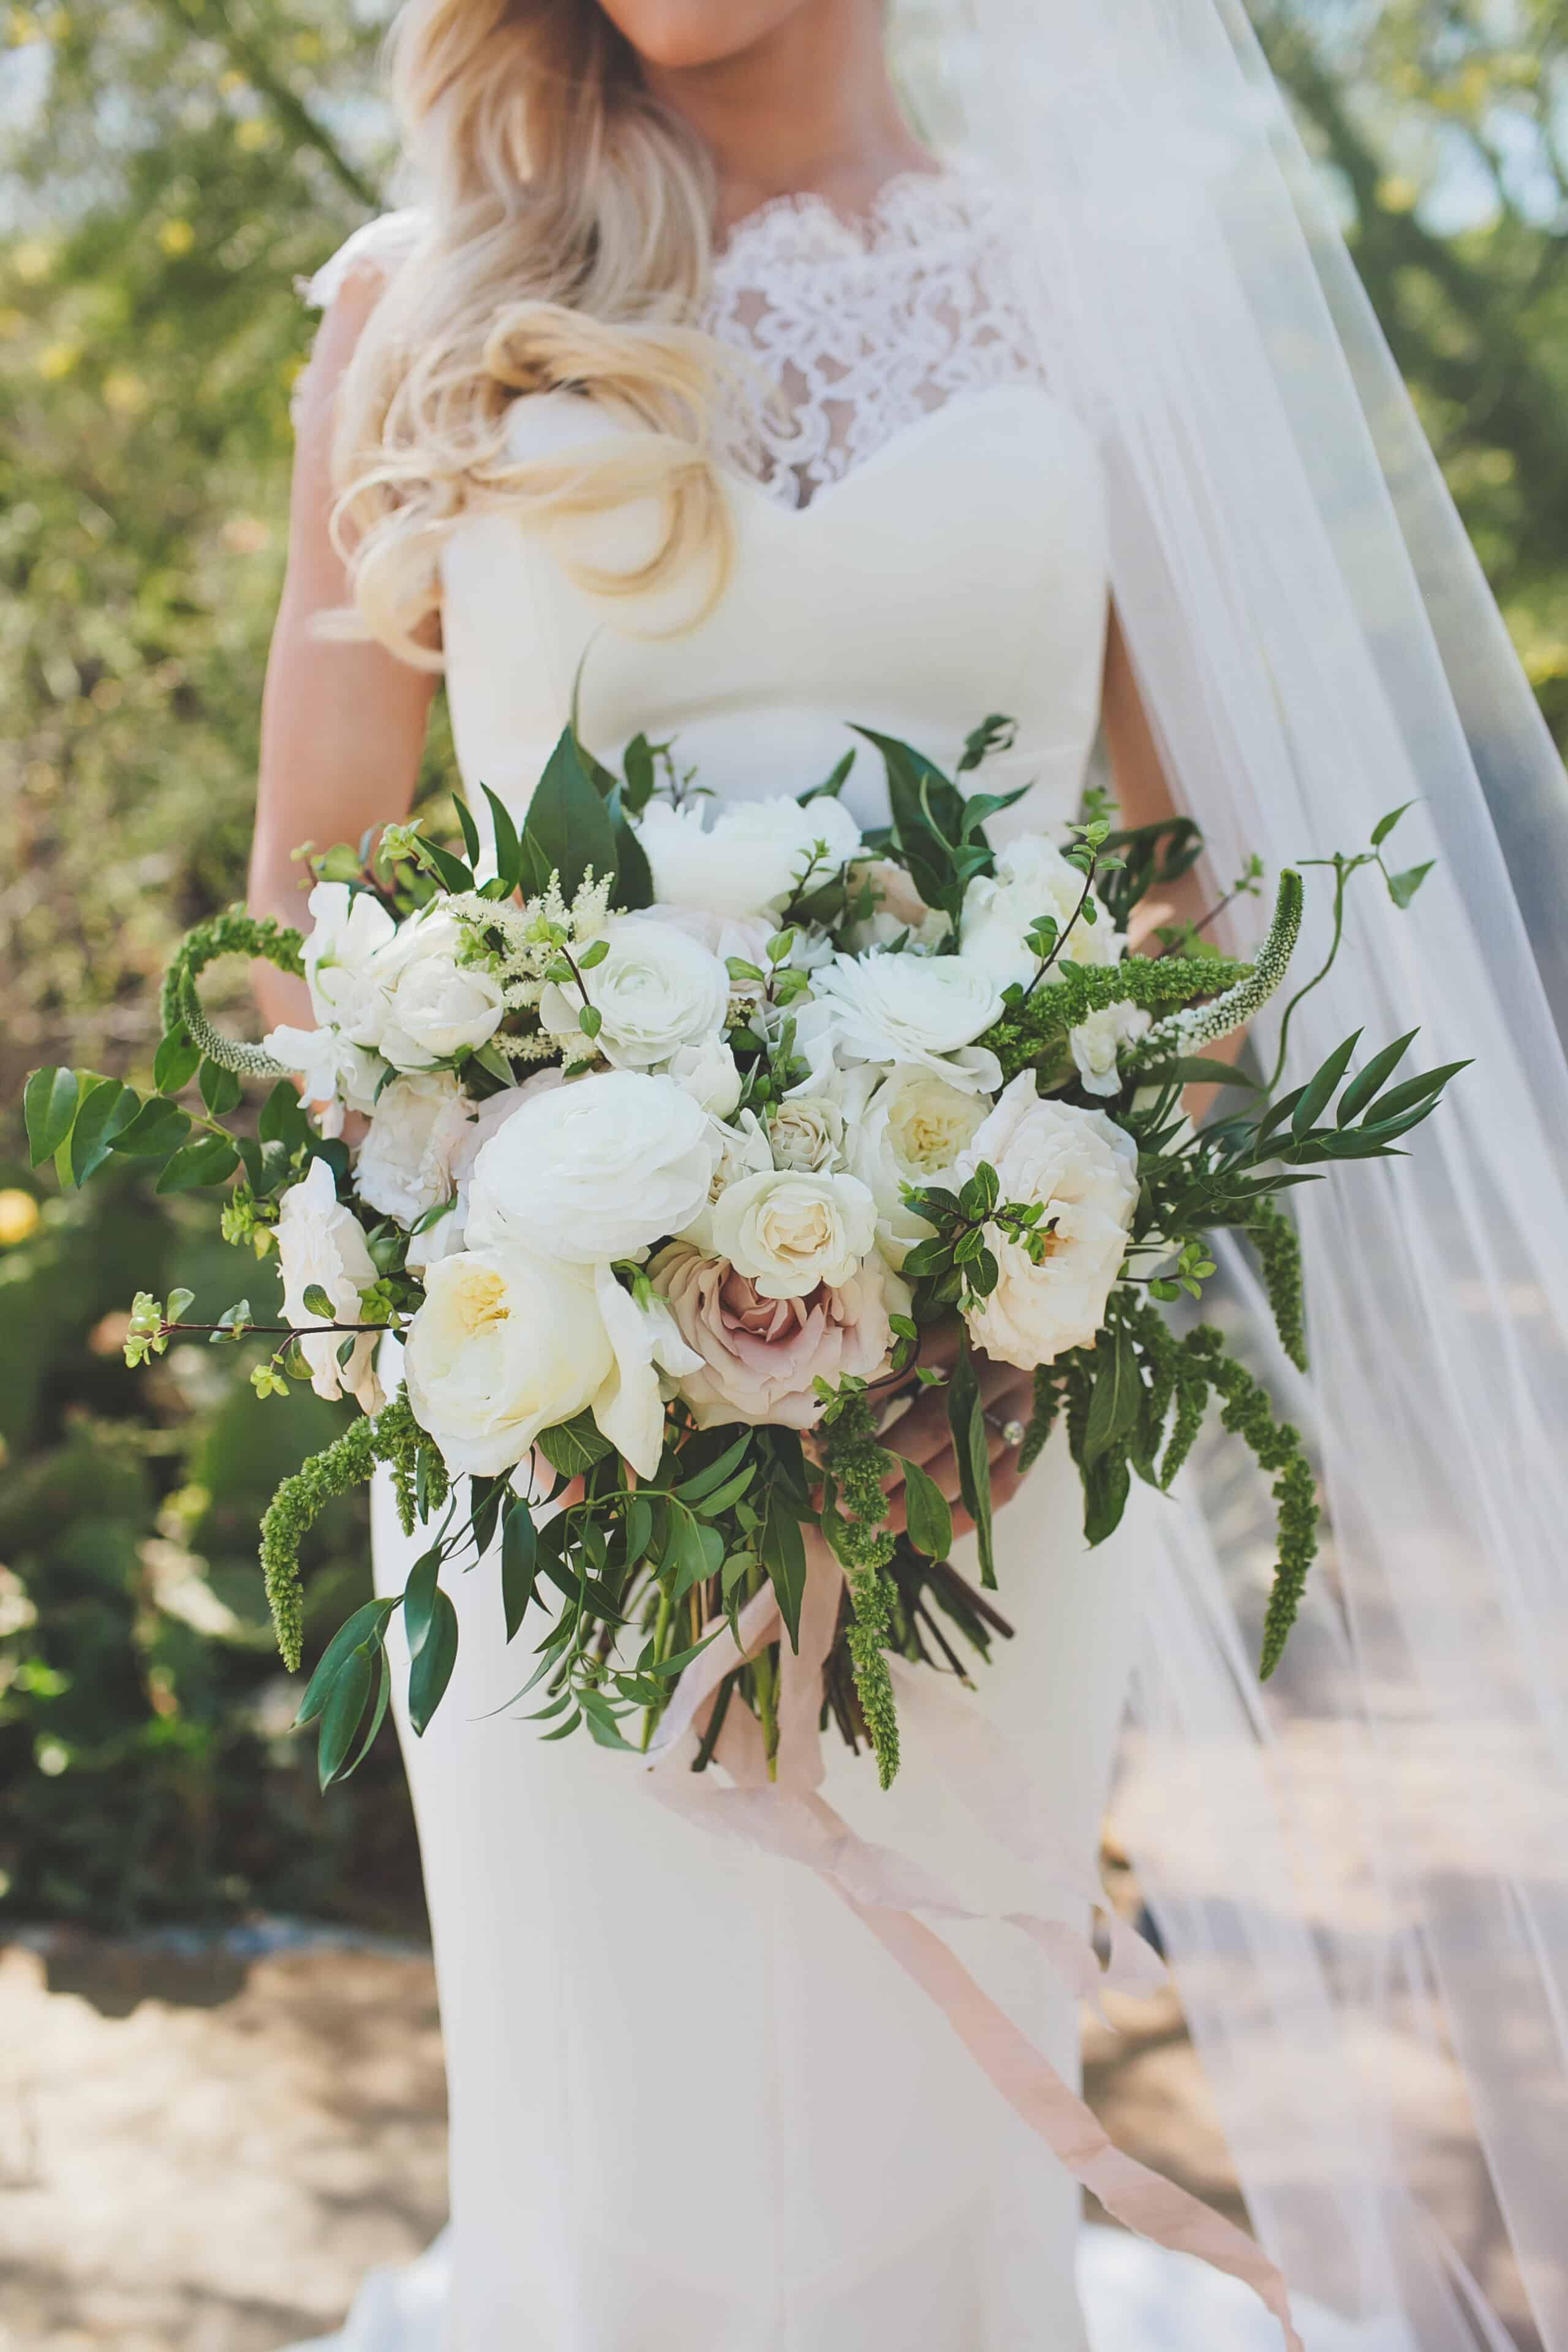 Couture Events Bridal Bouquet The Little Branch